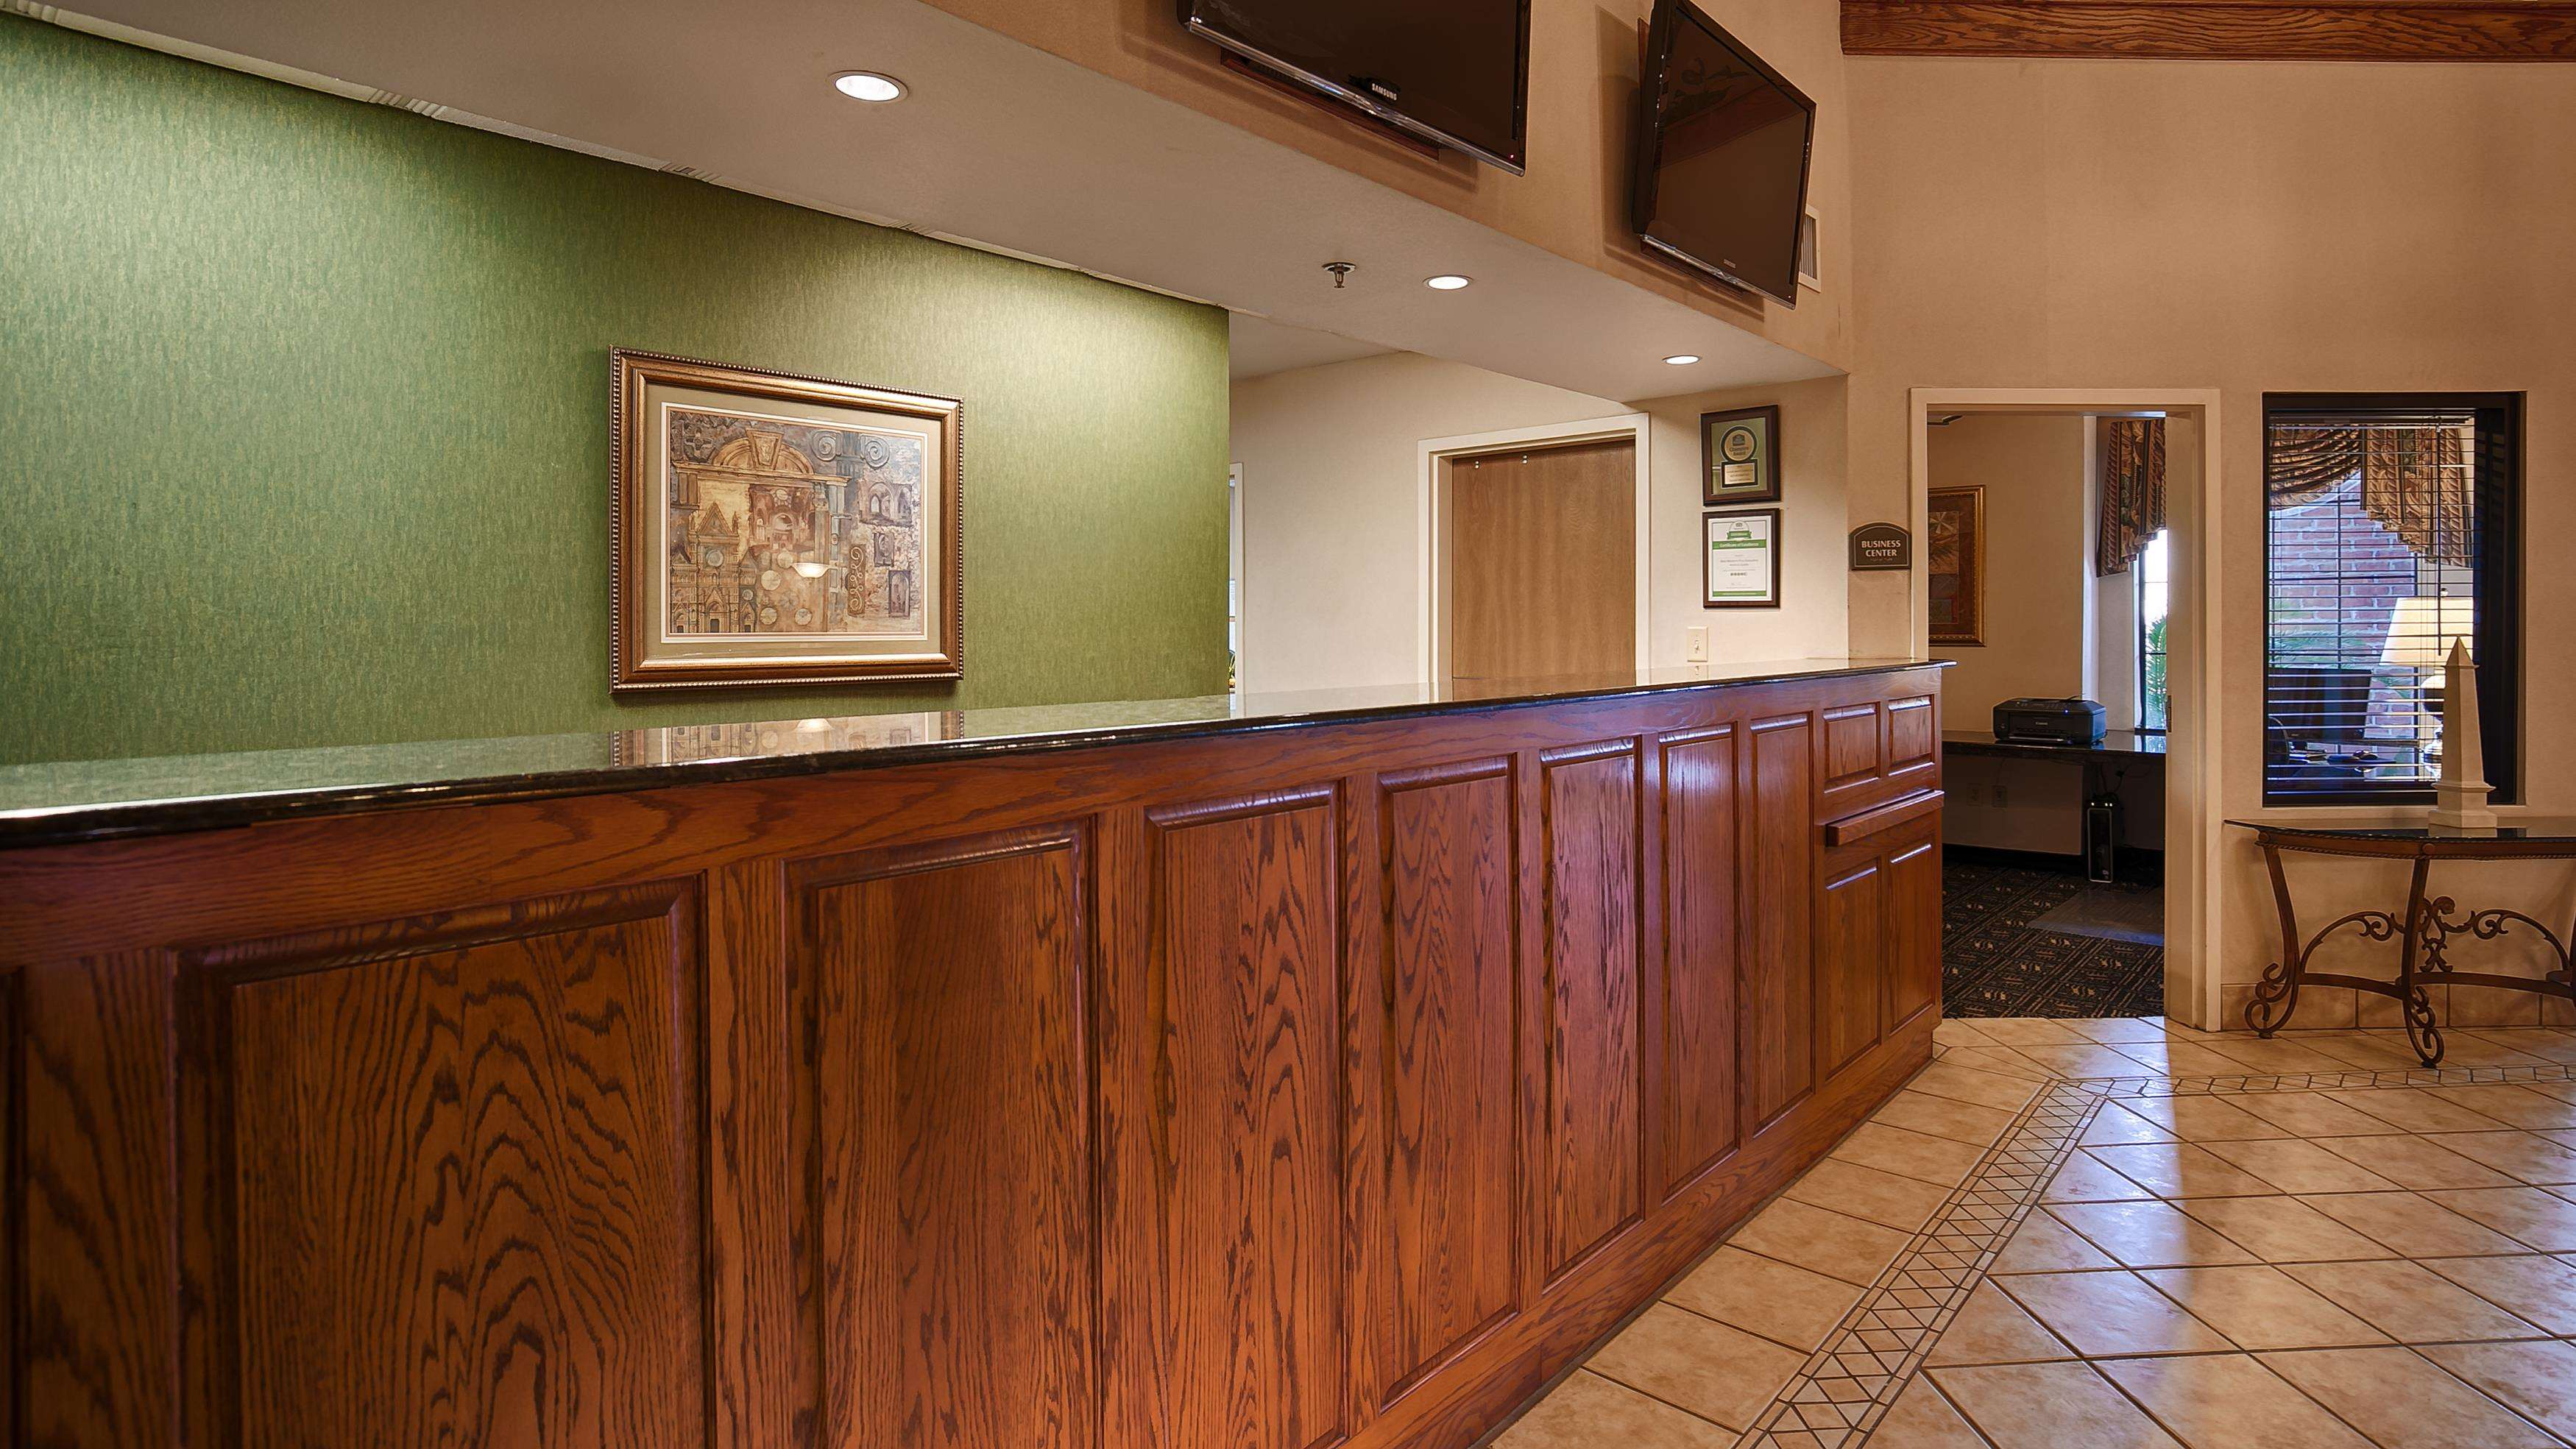 Best Western Plus Executive Hotel & Suites image 18